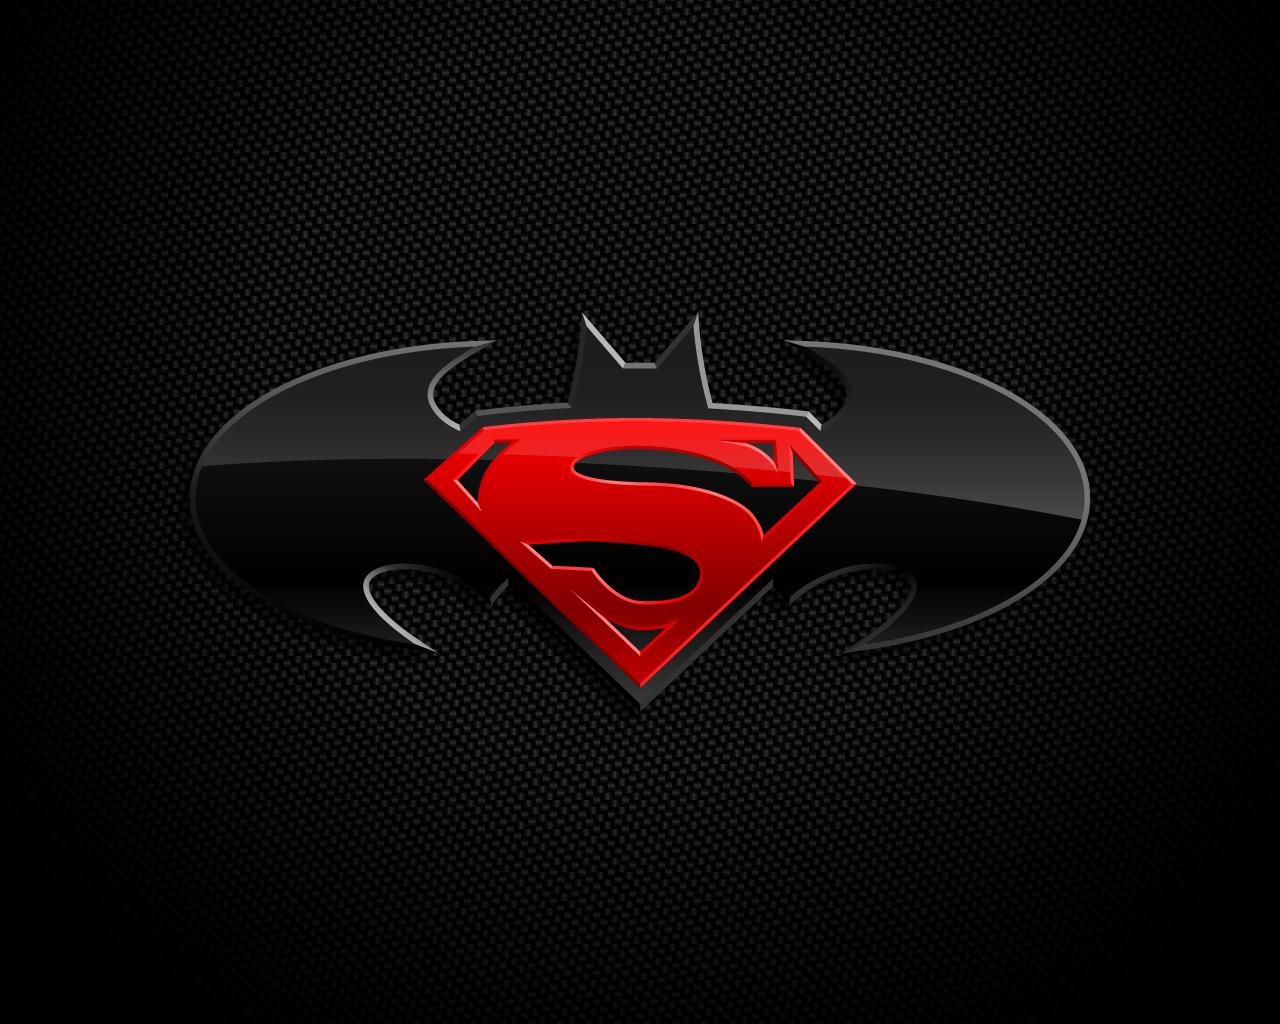 Baby Girl Hd Wallpaper Download Batman With Superman Logos Logos Amp Brands